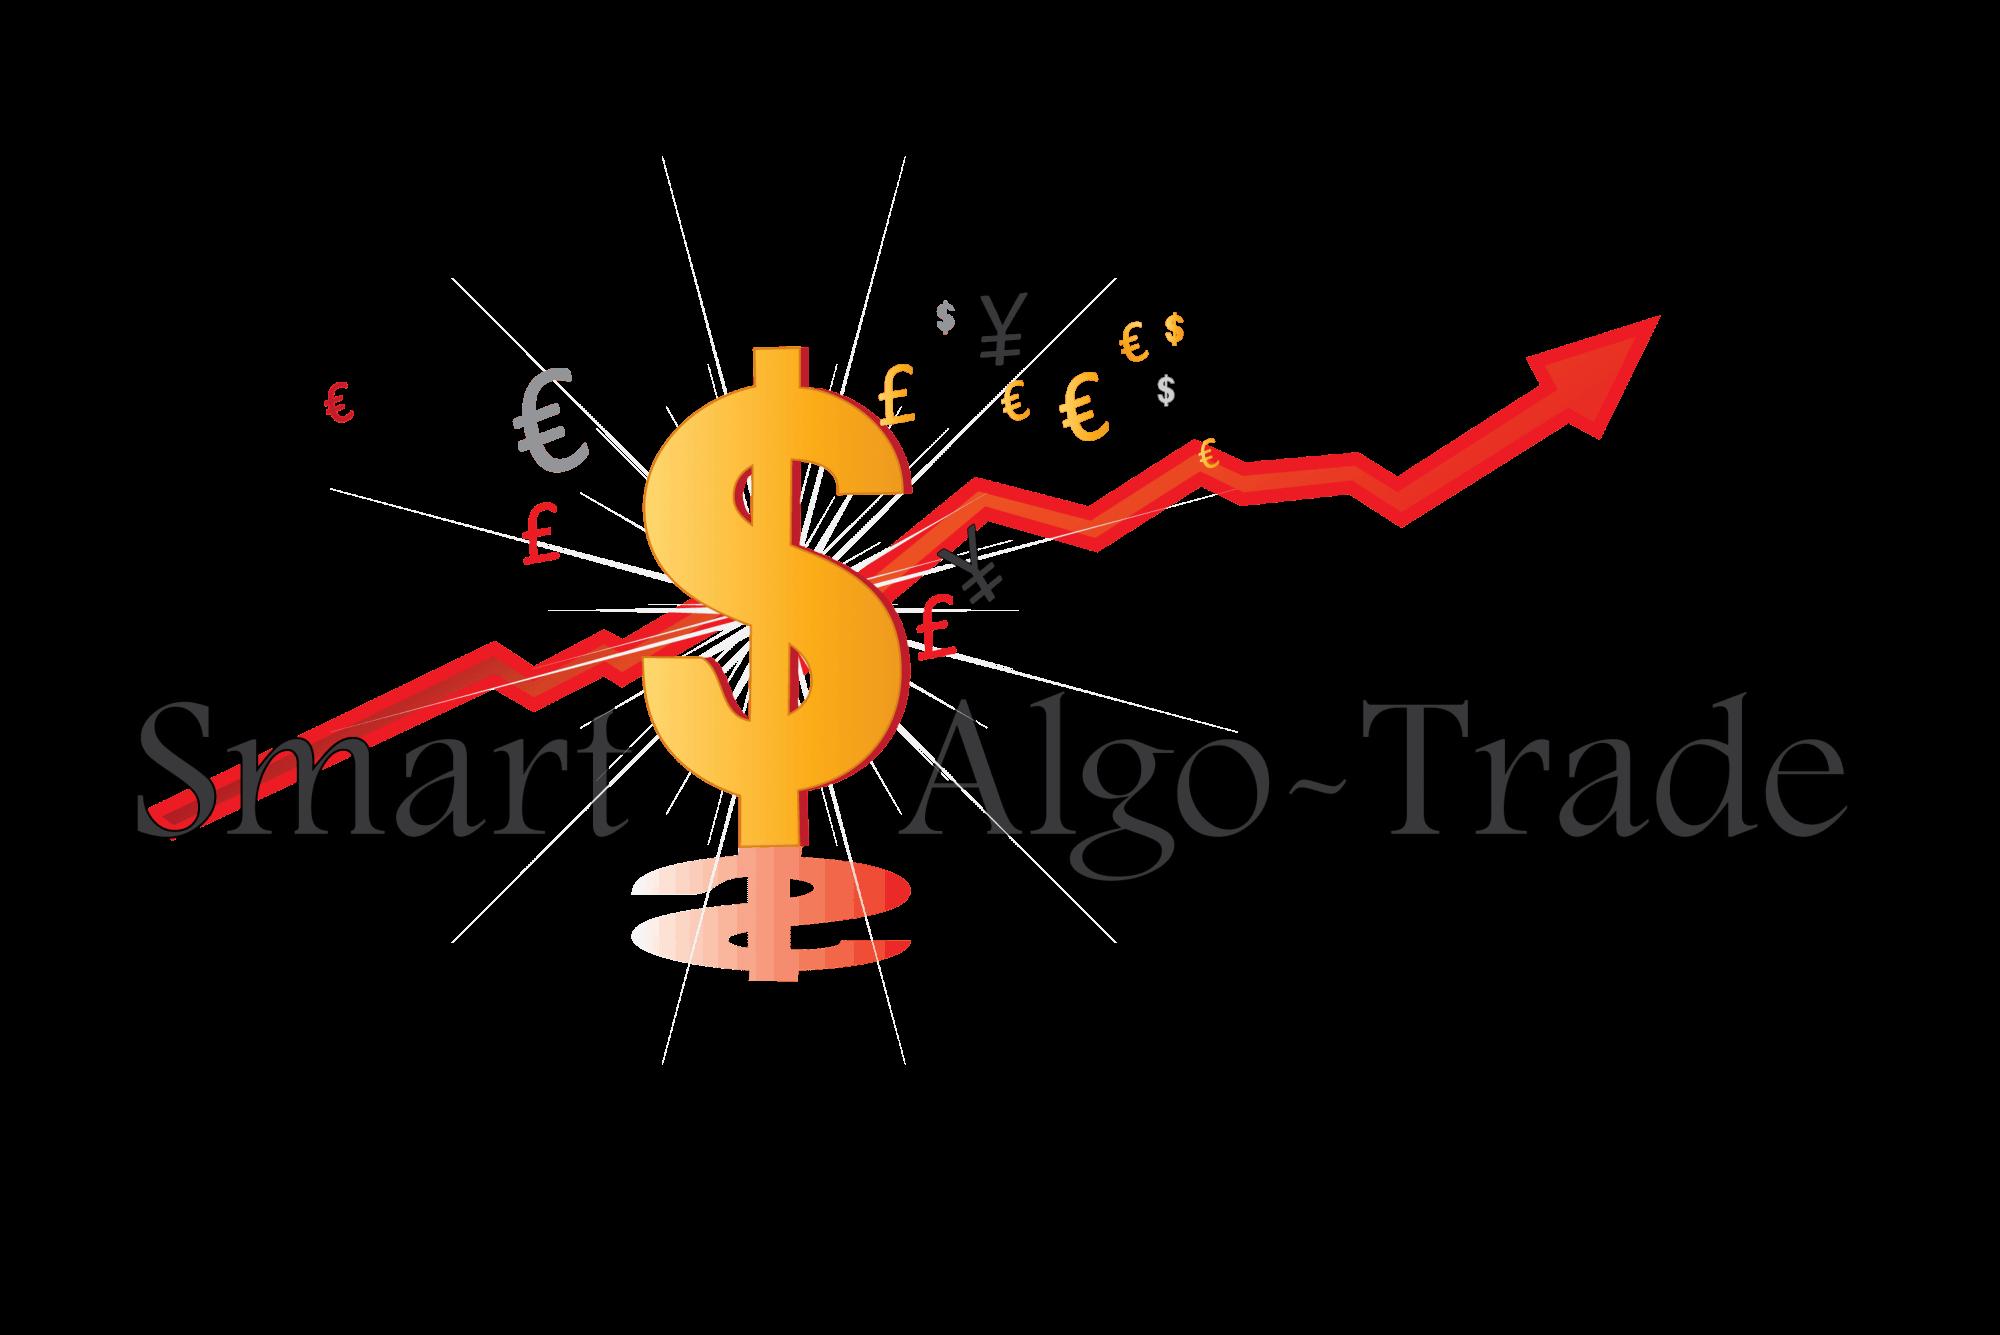 Algo Trading